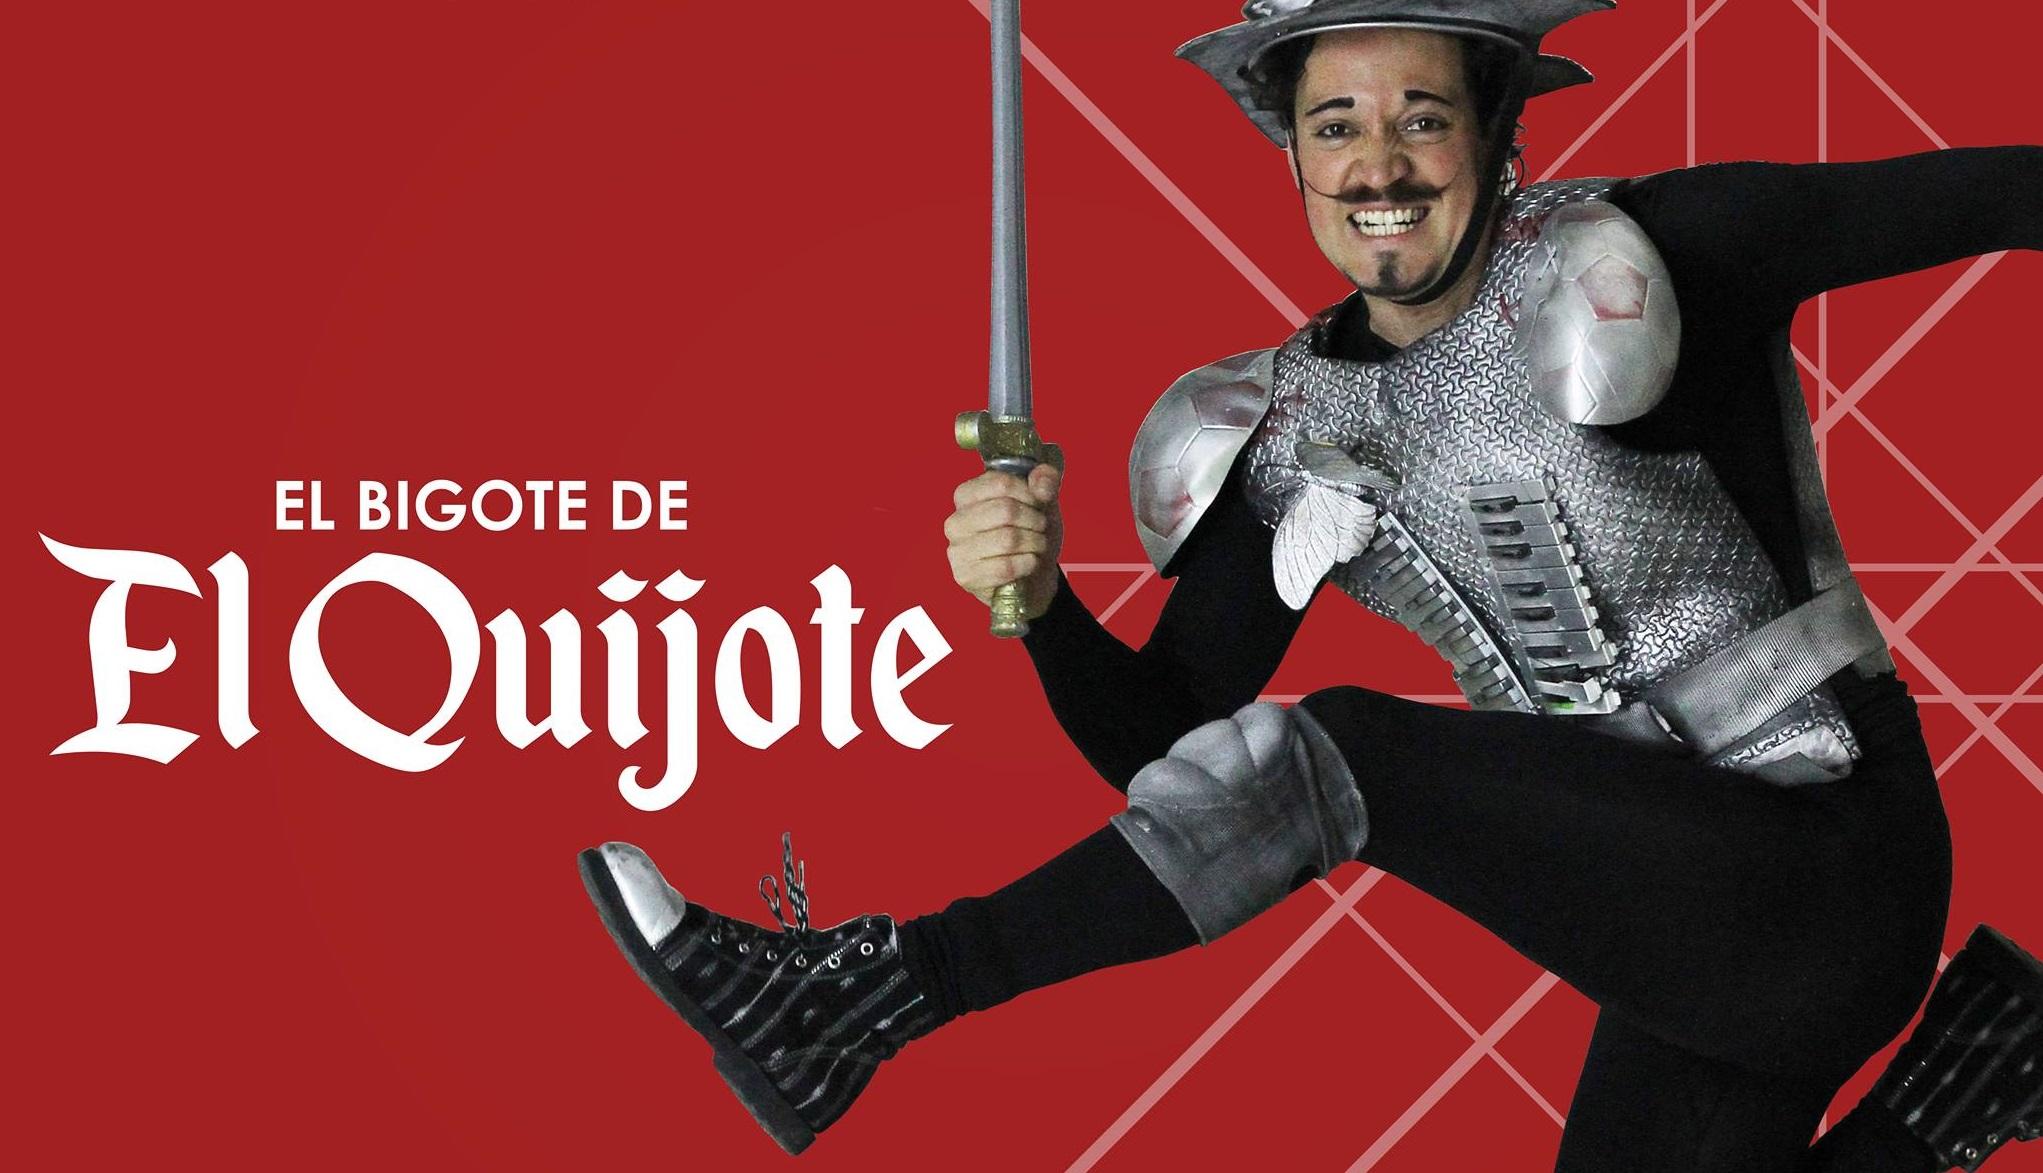 Obra de teatro | El Bigote de El Quijote